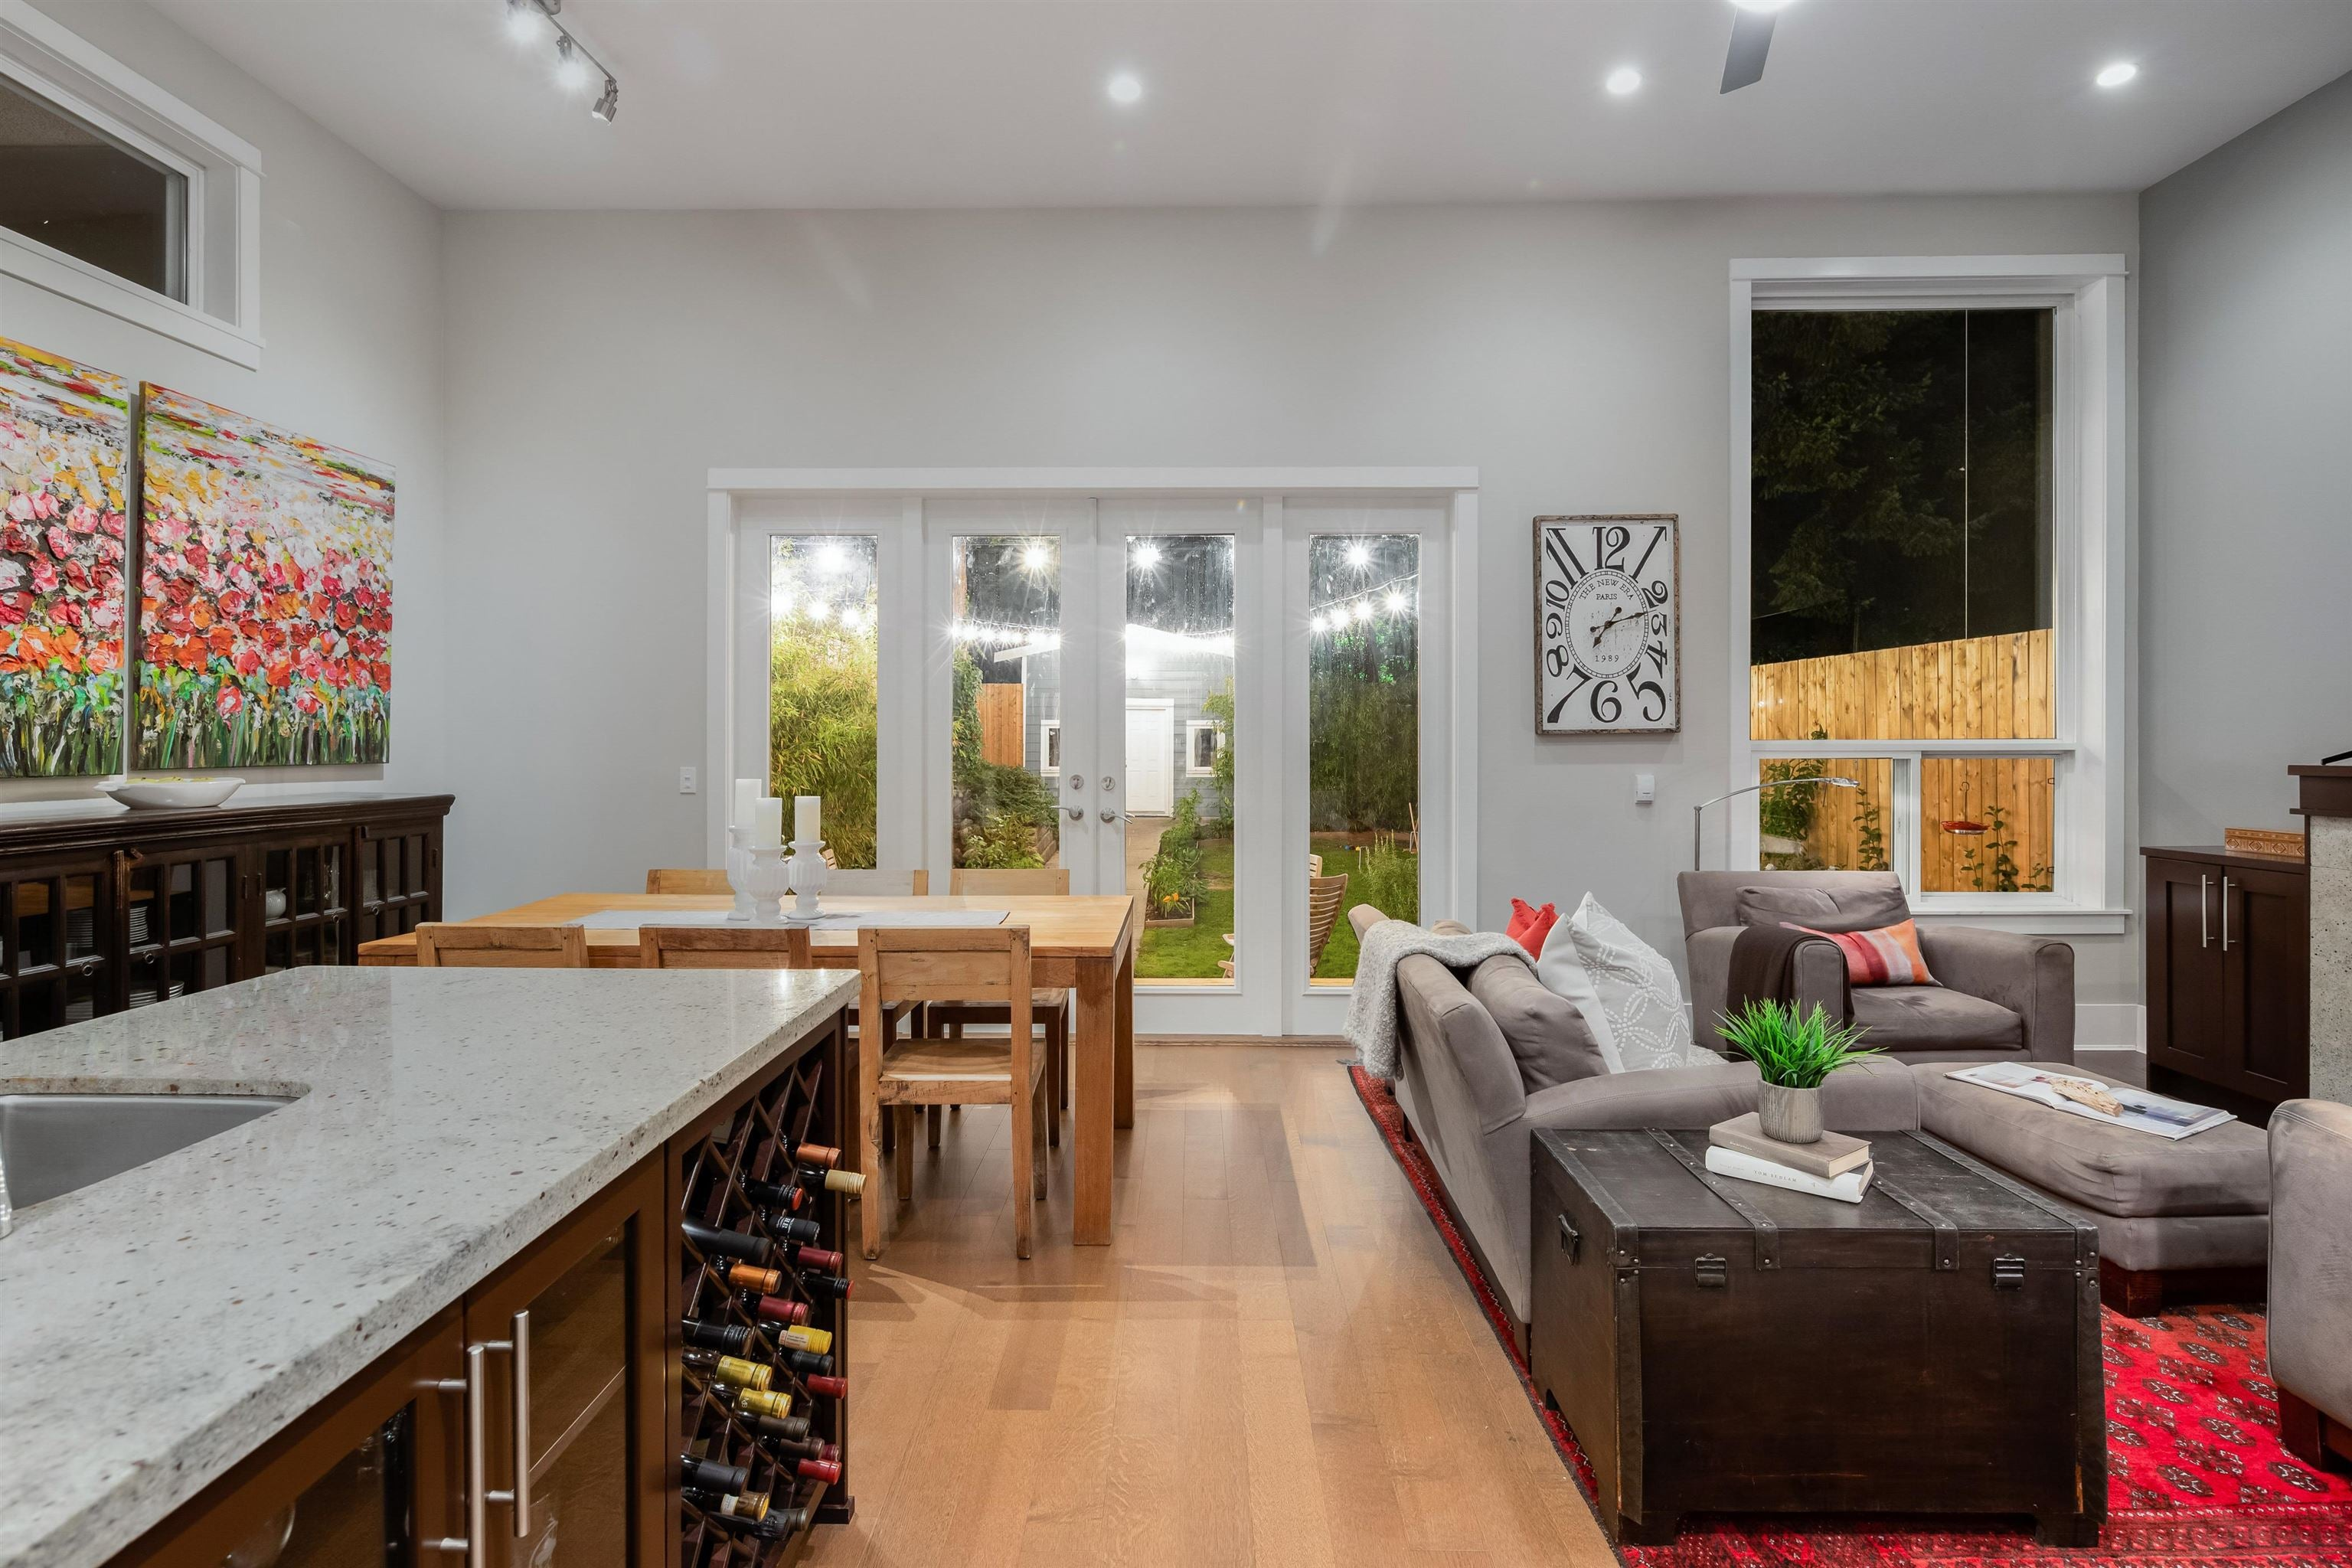 2258 WINDRIDGE DRIVE - Seymour NV House/Single Family for sale, 5 Bedrooms (R2617156) - #14